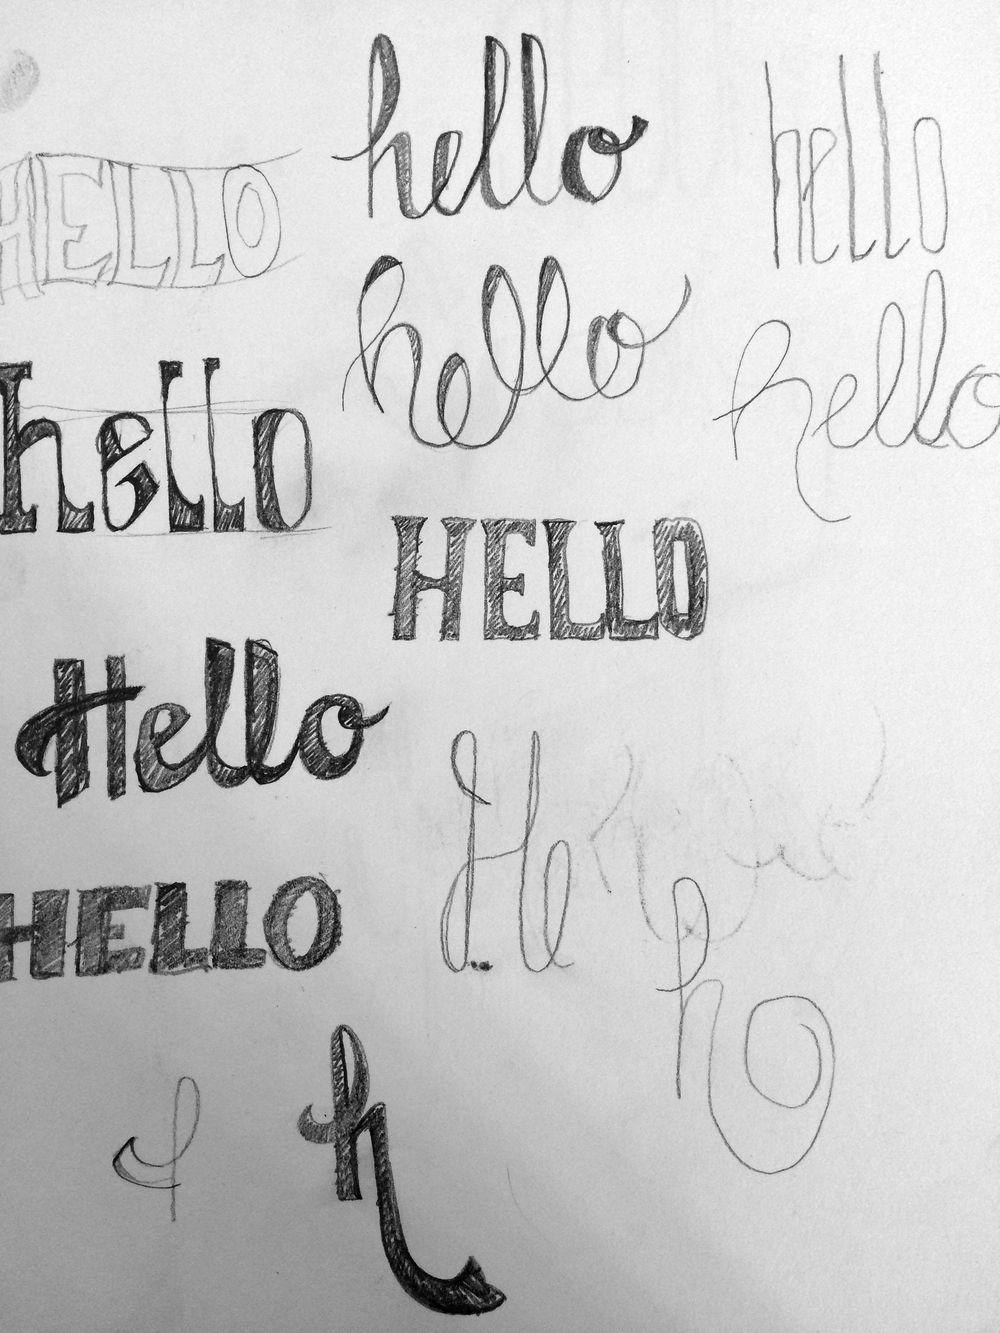 Hello My Dear Boy! - image 1 - student project